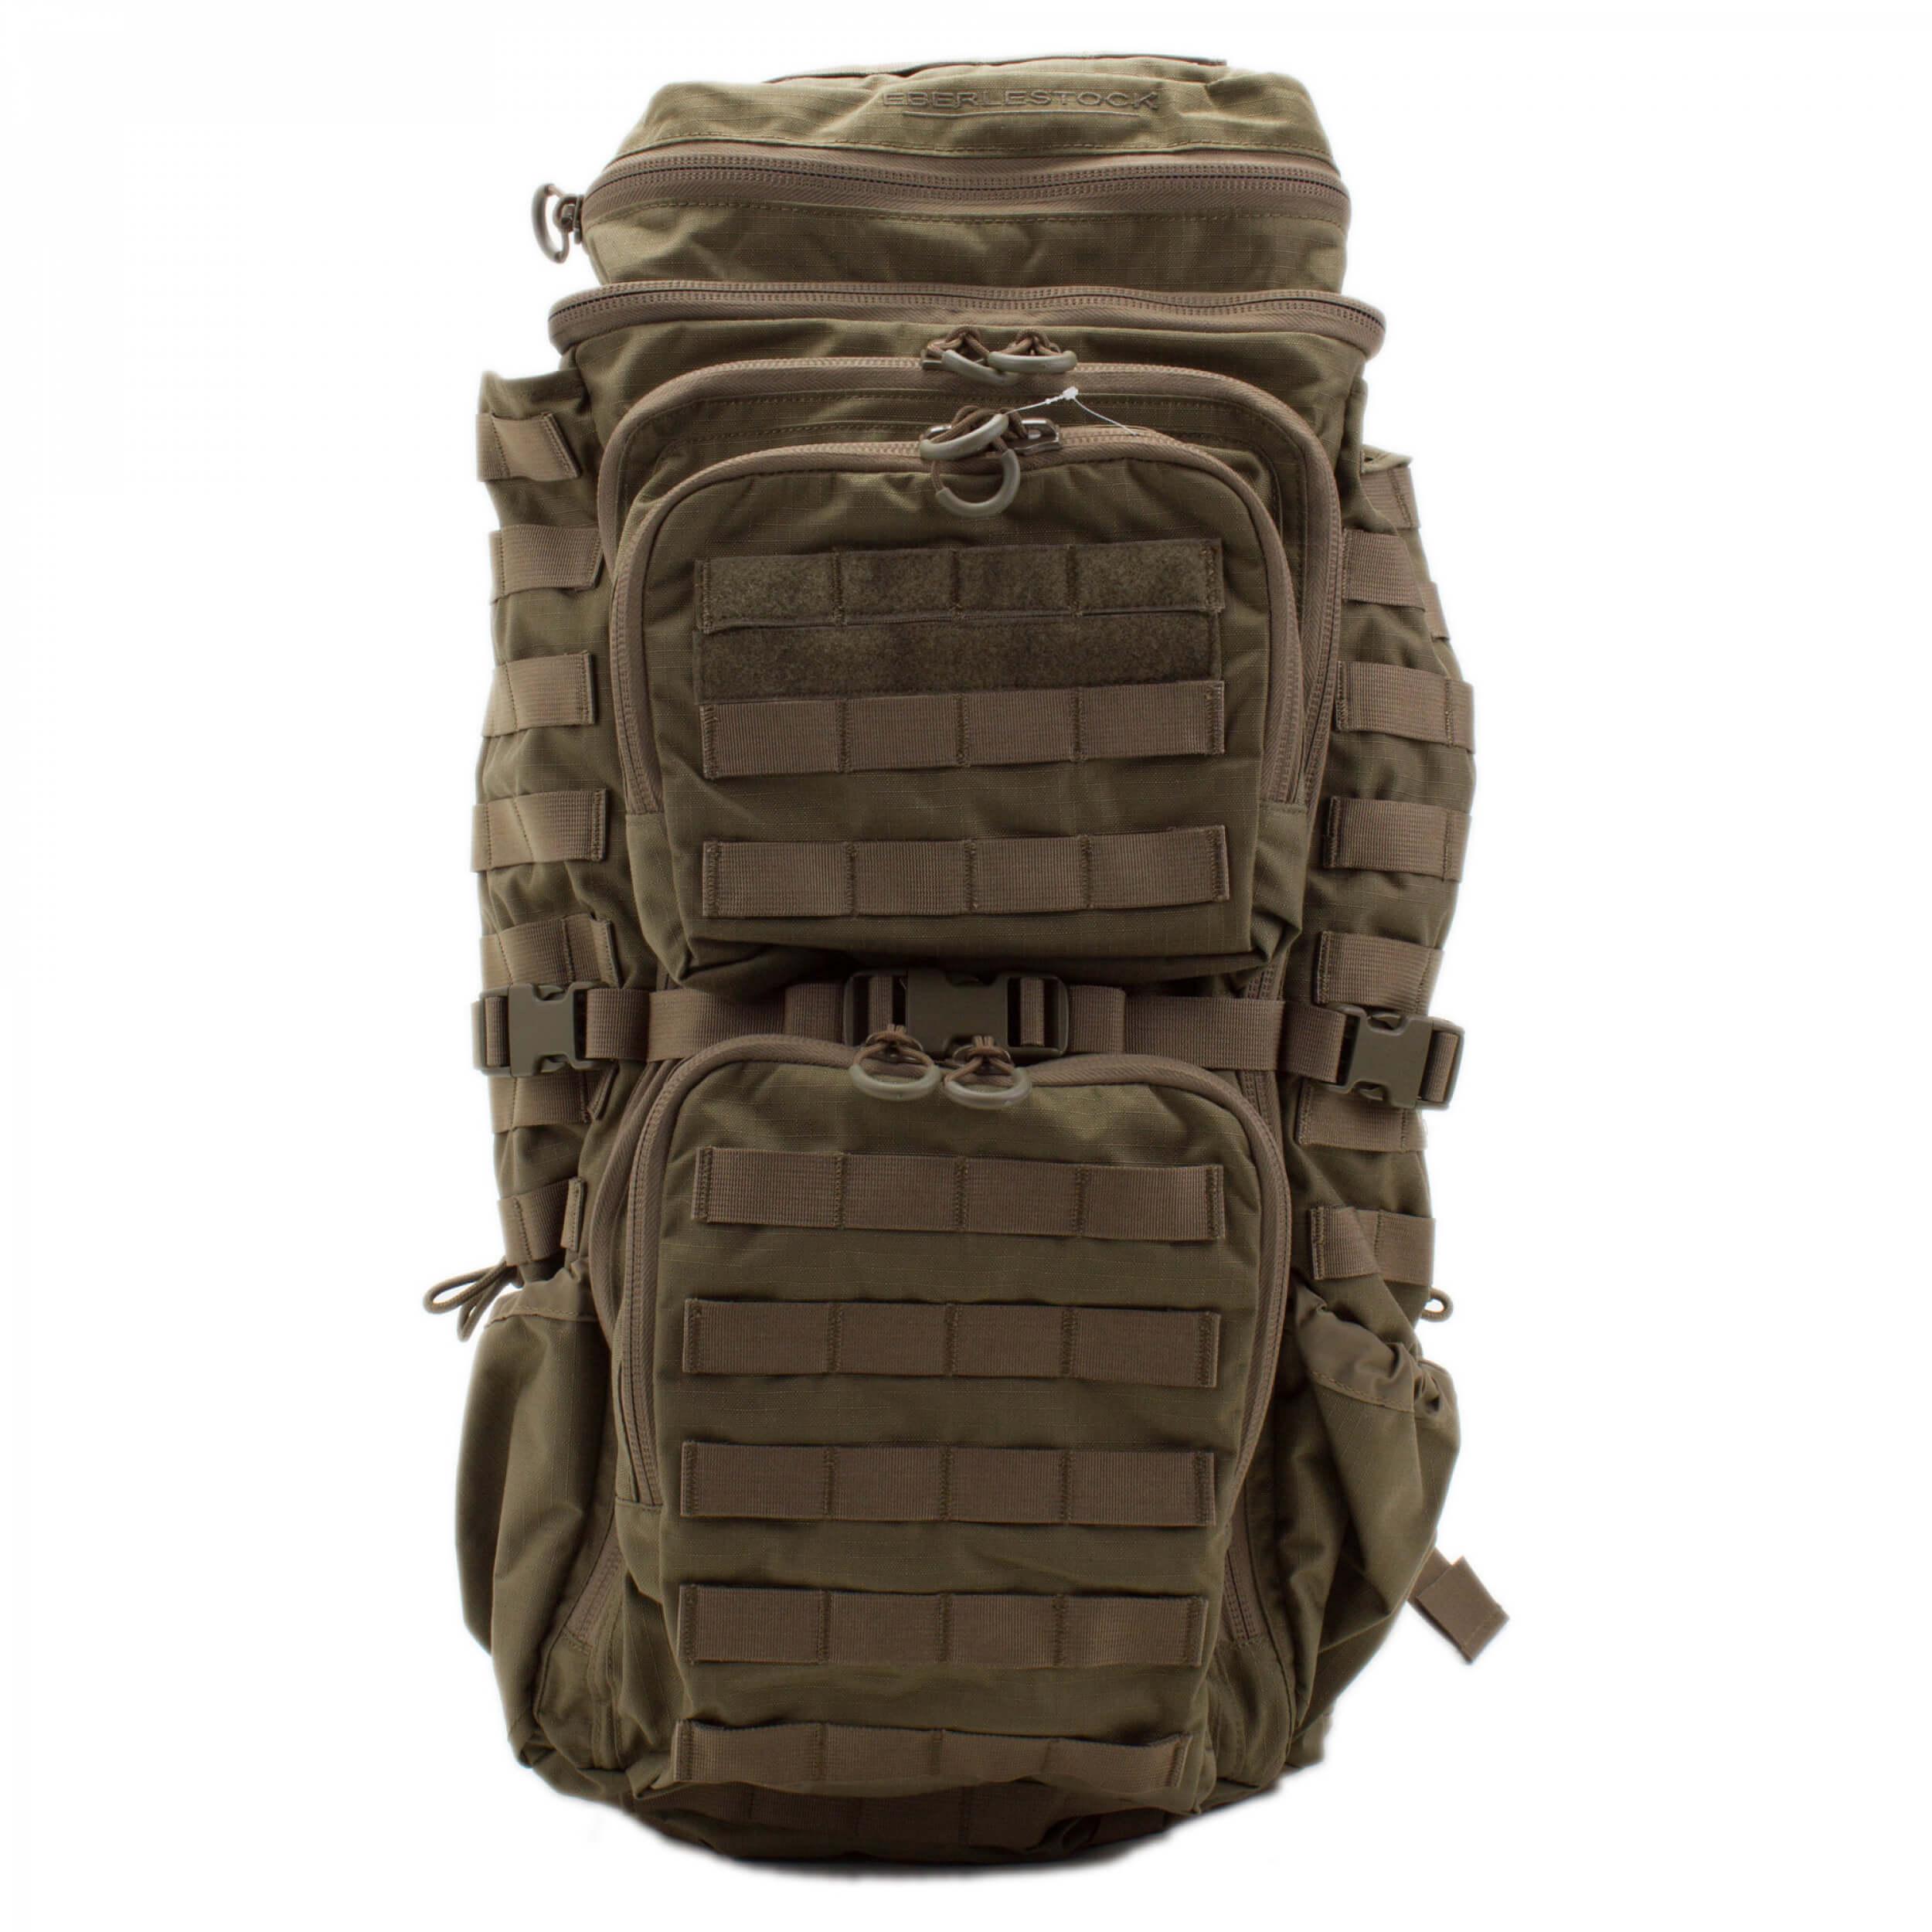 Eberlestock FAC Track Pack Military Green